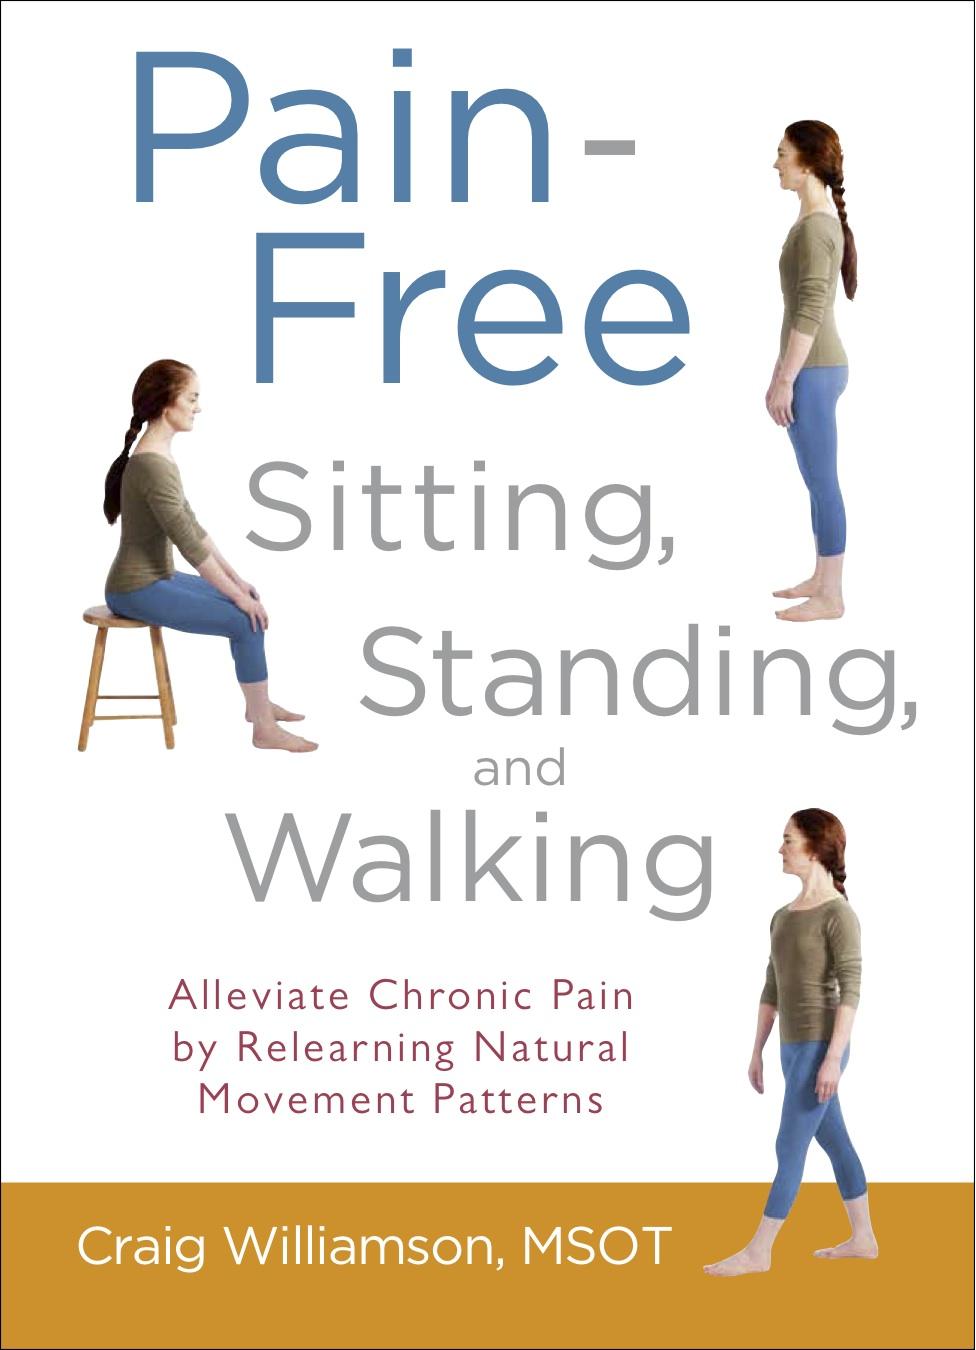 Pain-Free Sitting, Standing, & Walking comps 3.jpg